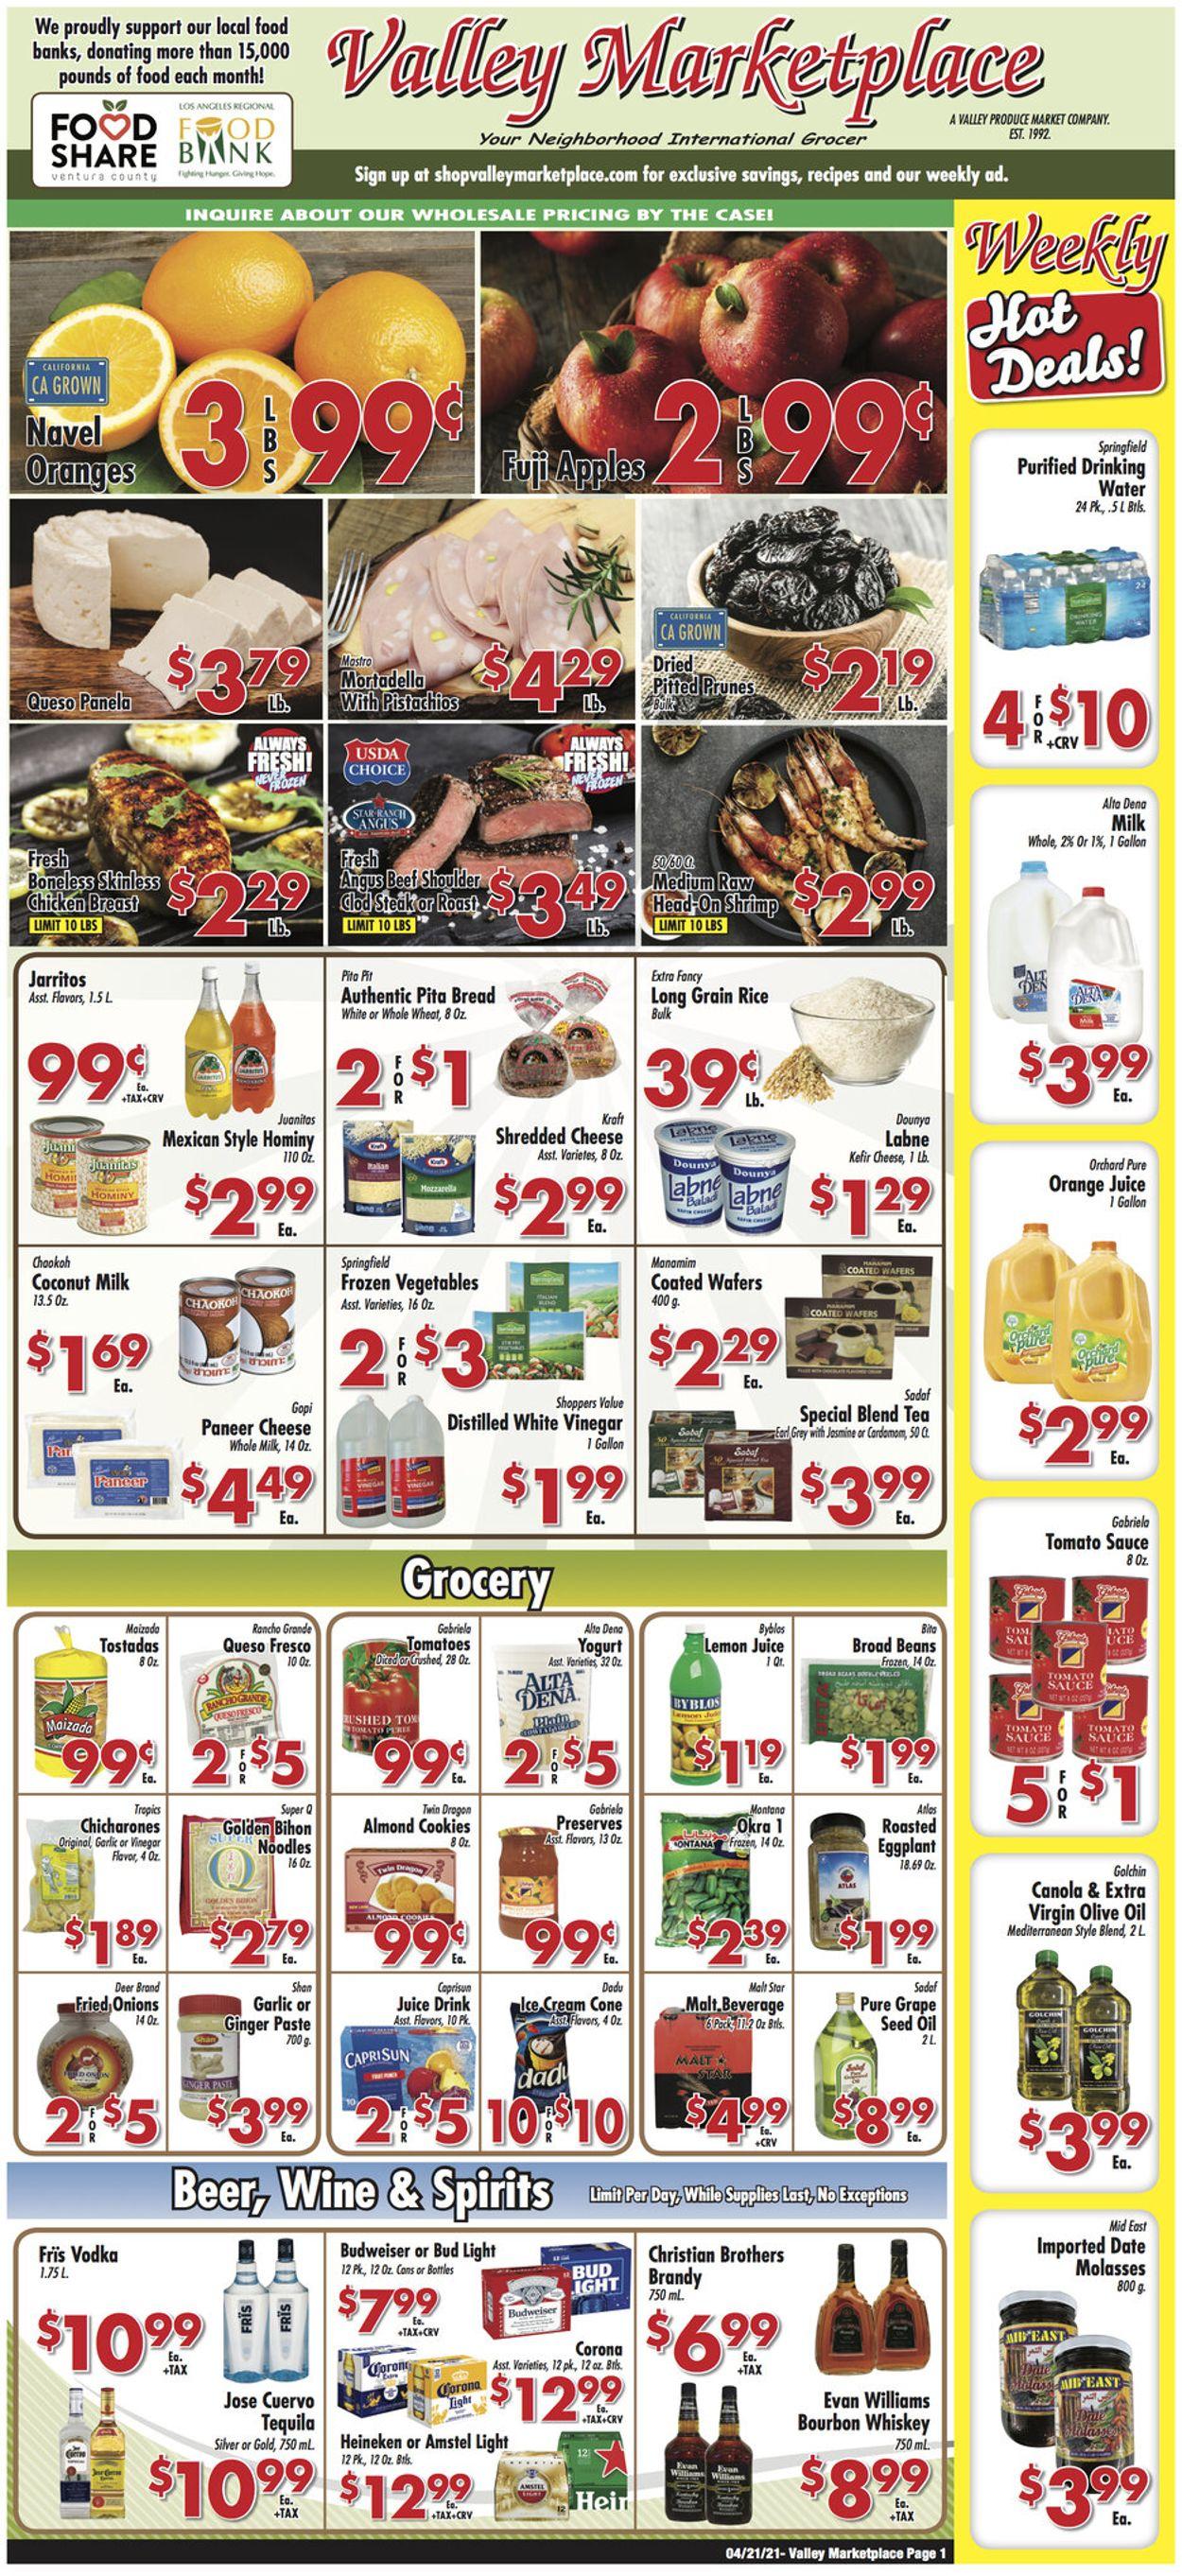 Valley Marketplace Weekly Ad Circular - valid 04/21-04/27/2021